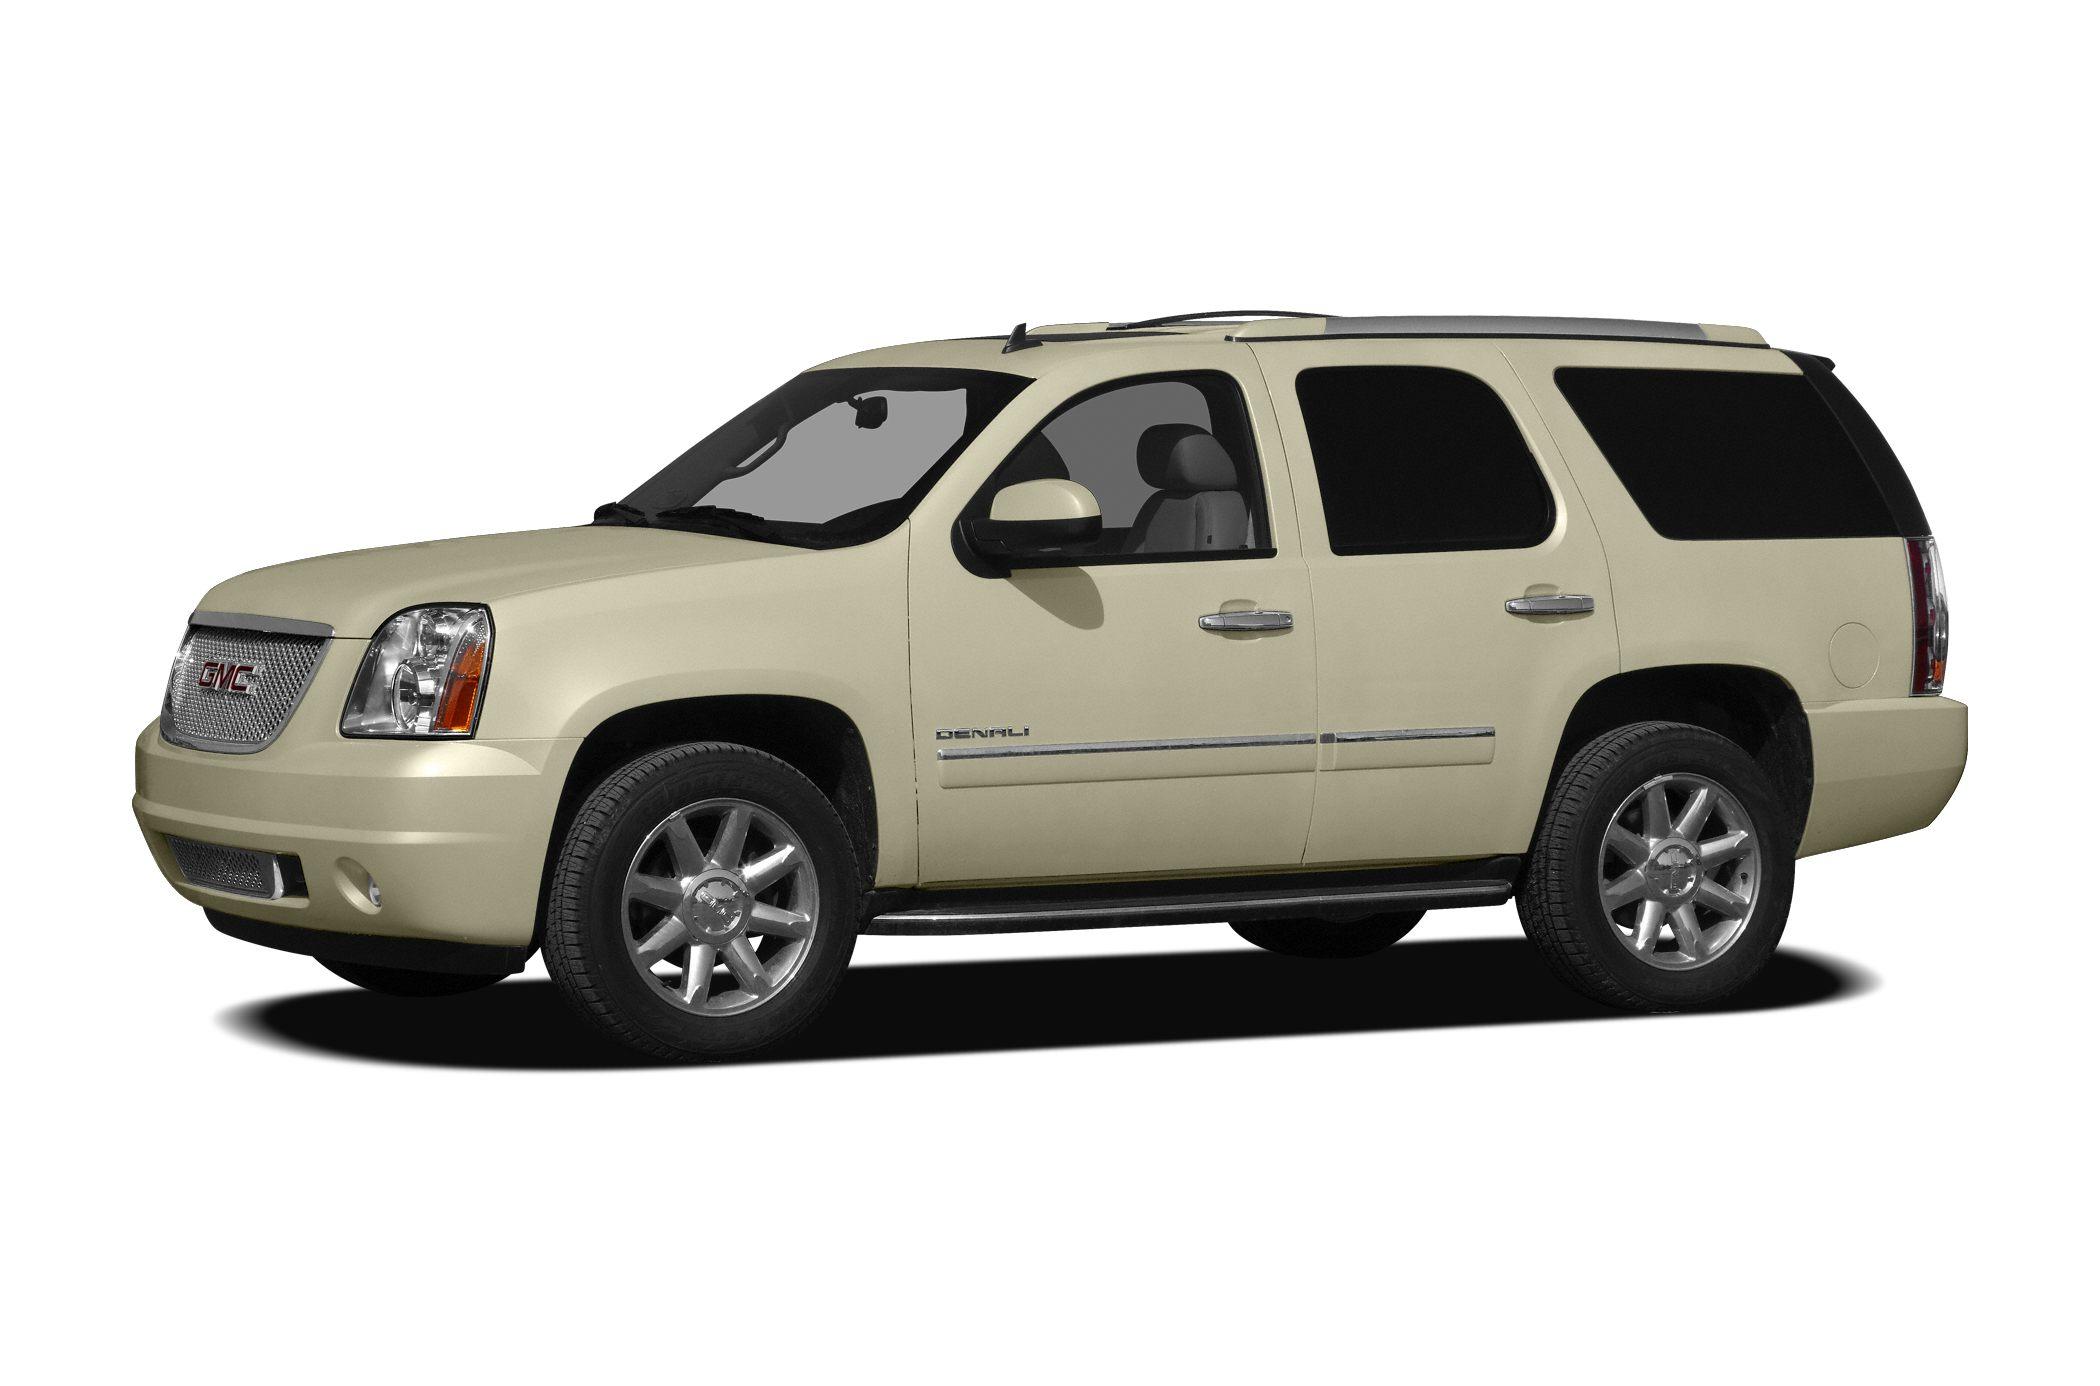 2010 GMC Yukon Denali 4x2 Pricing and Options